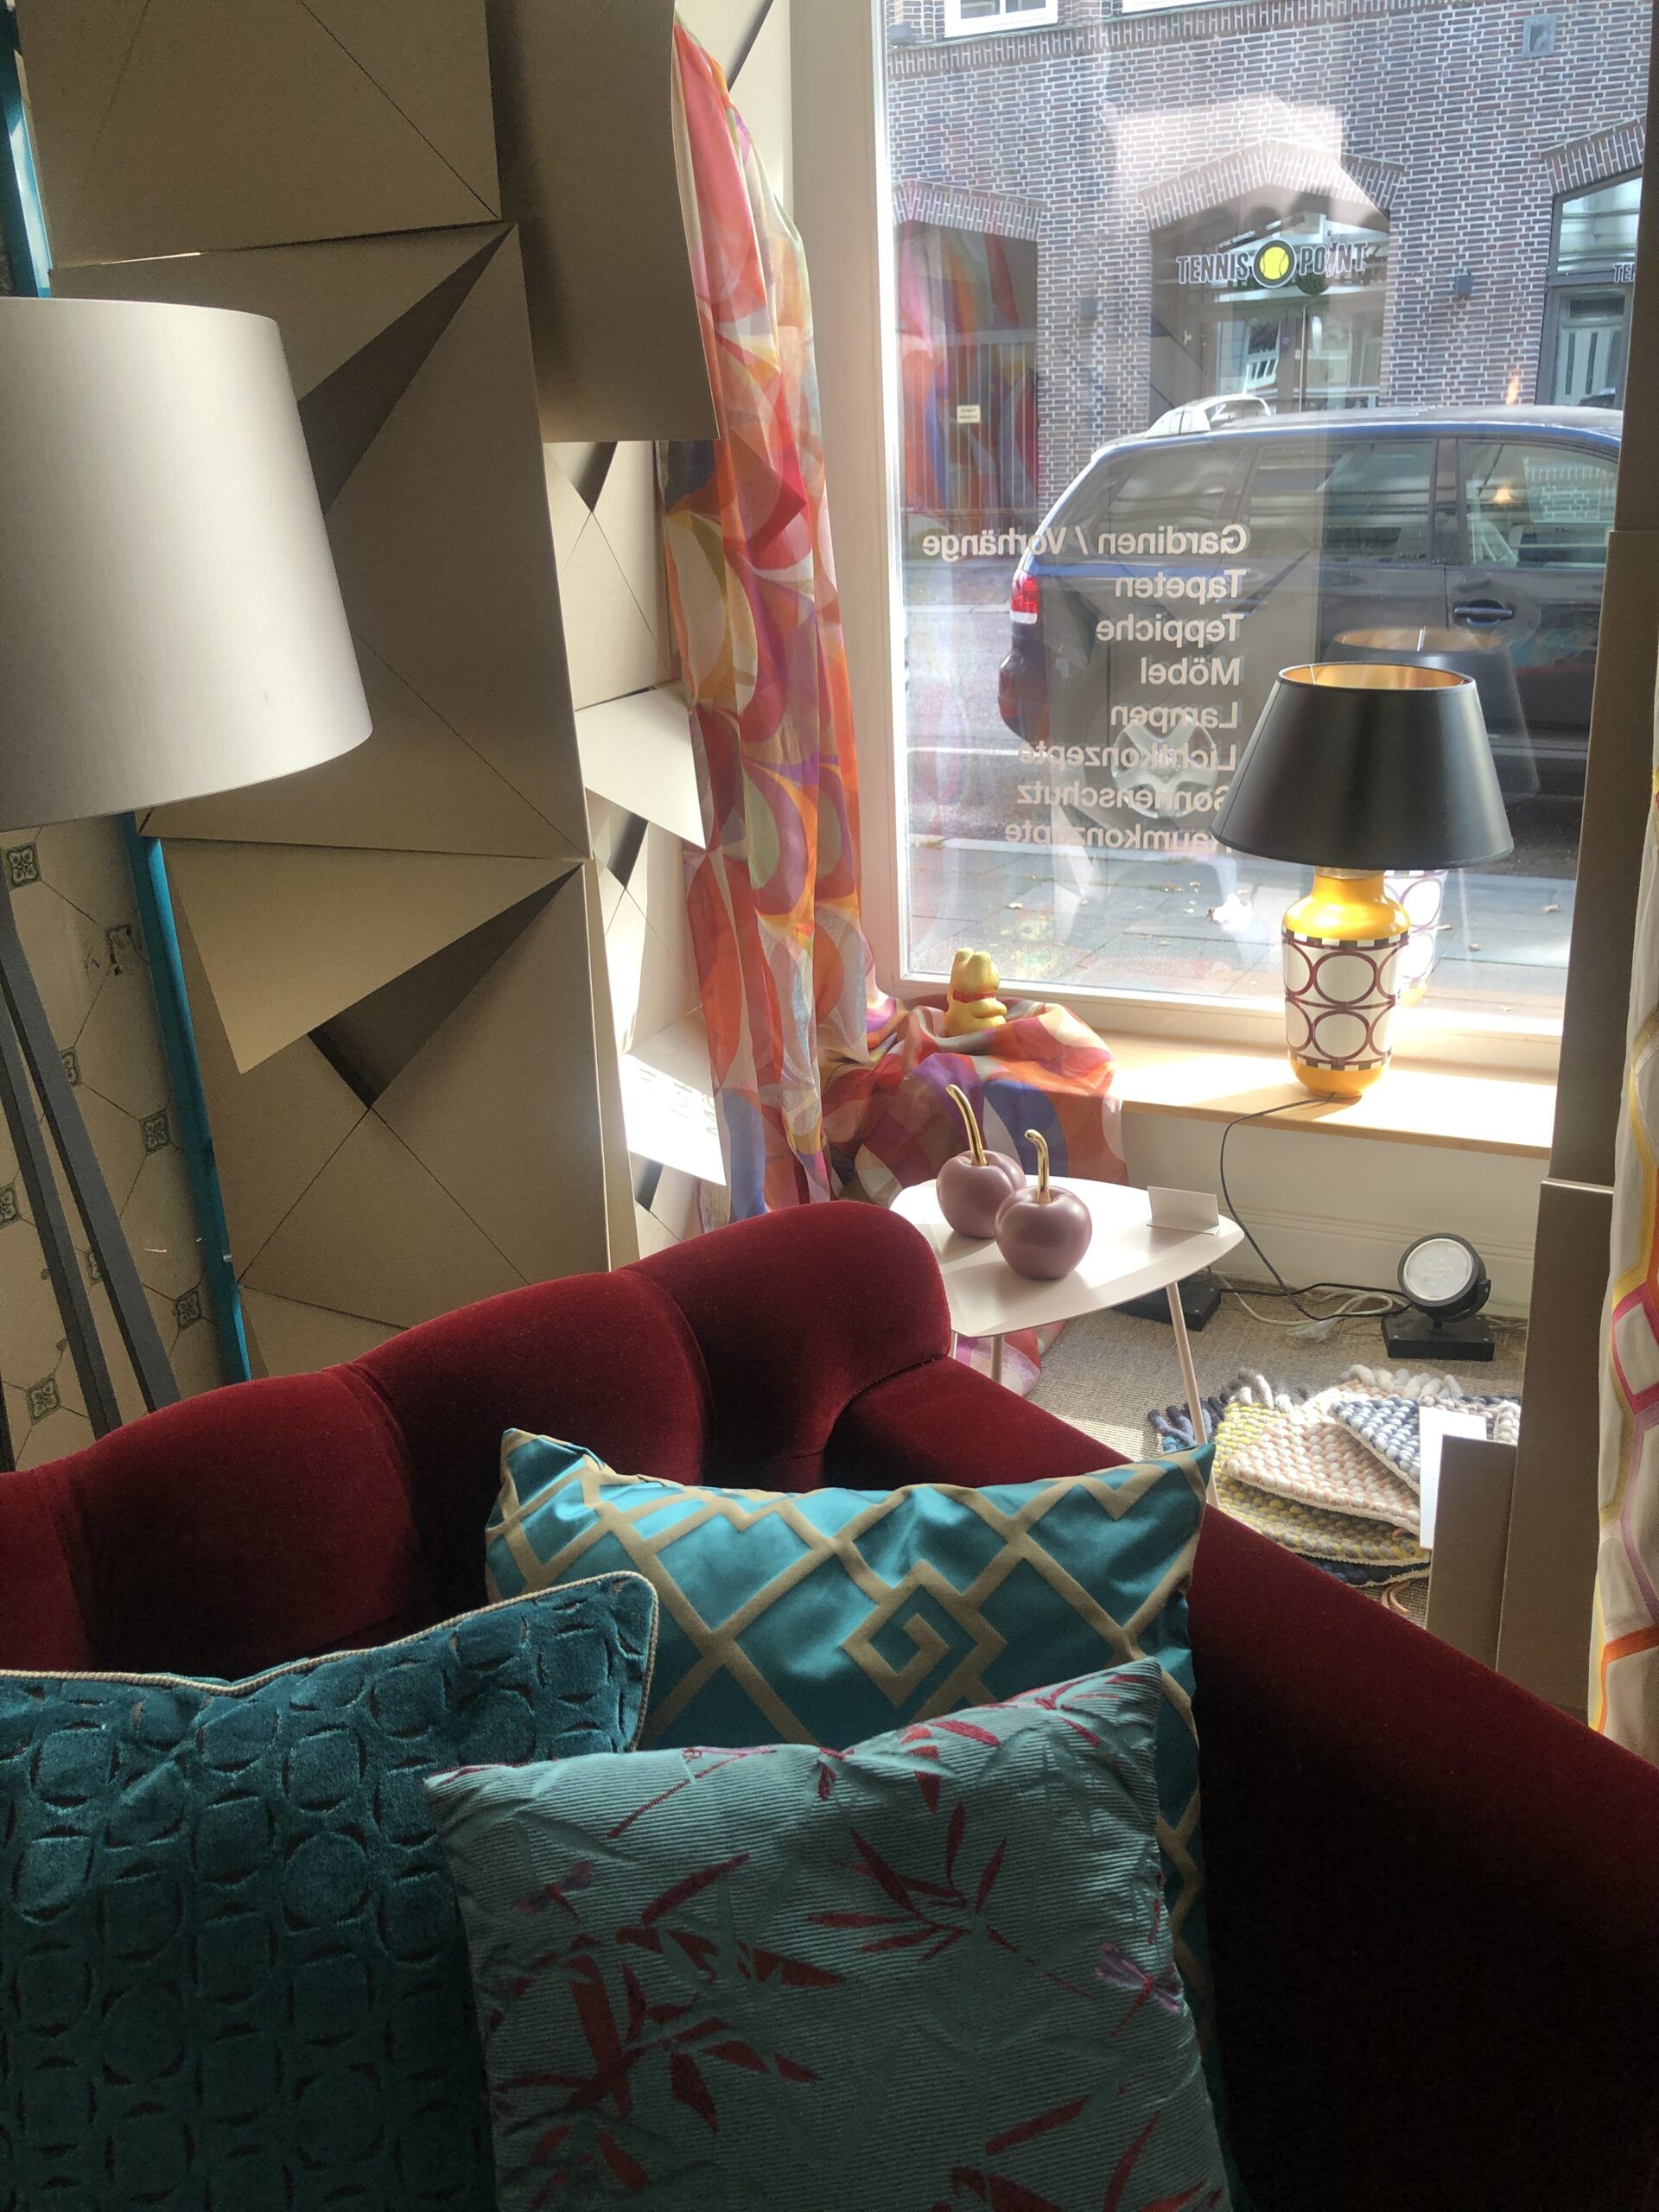 Schaufensterdeko - rotes Sofa